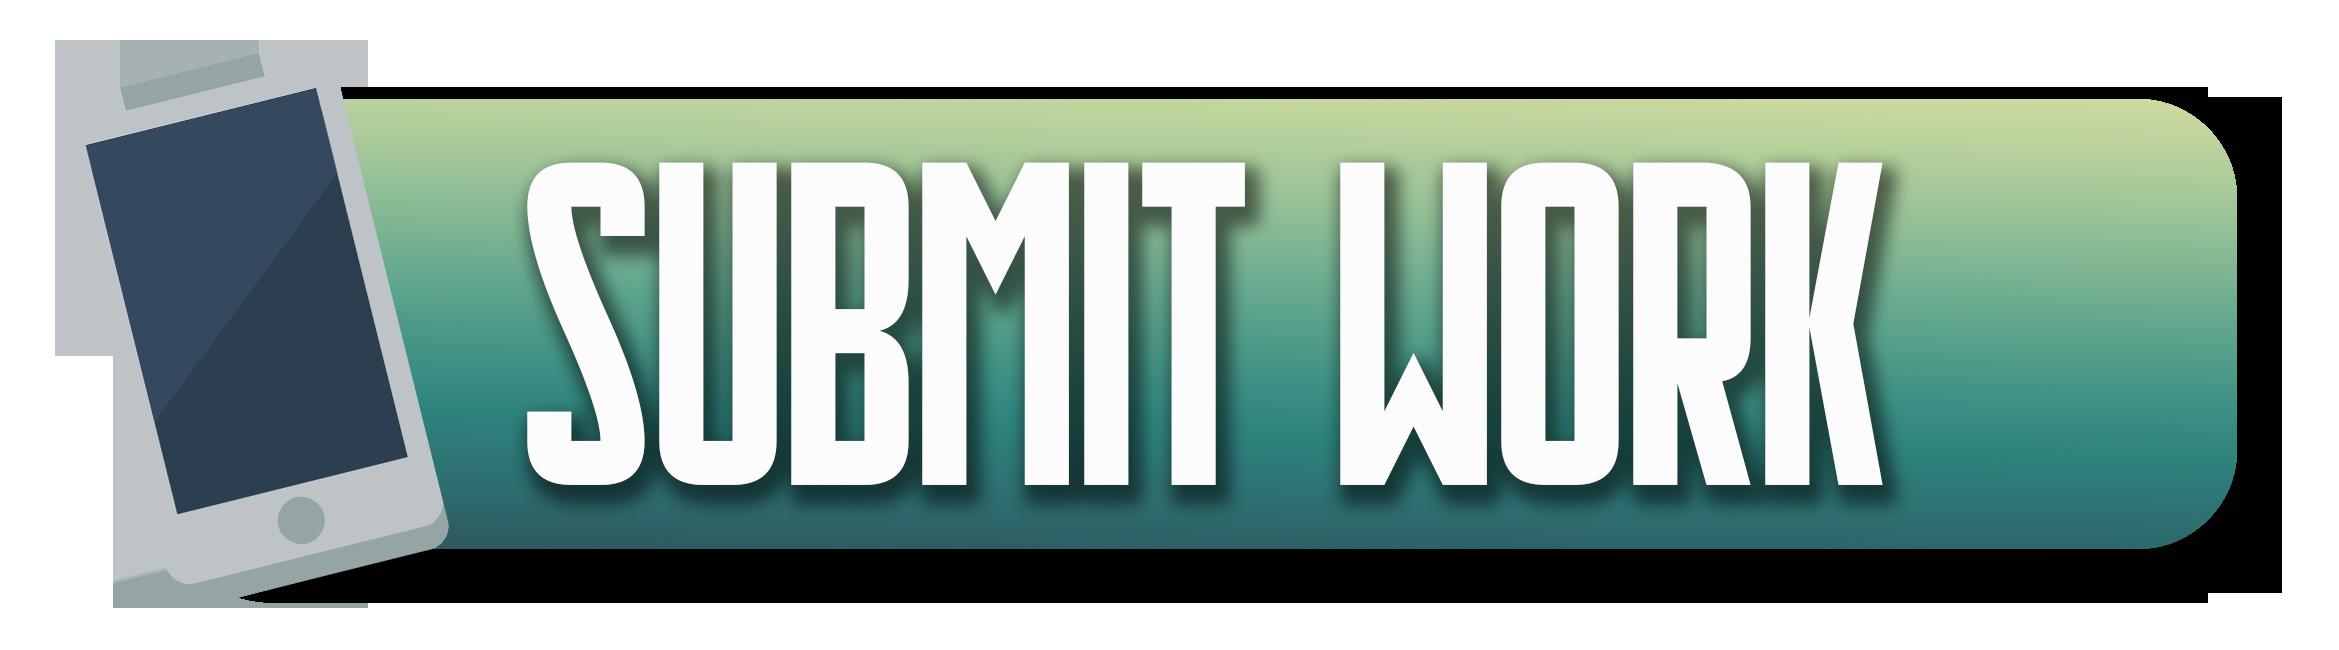 SubmitWorkBUtton